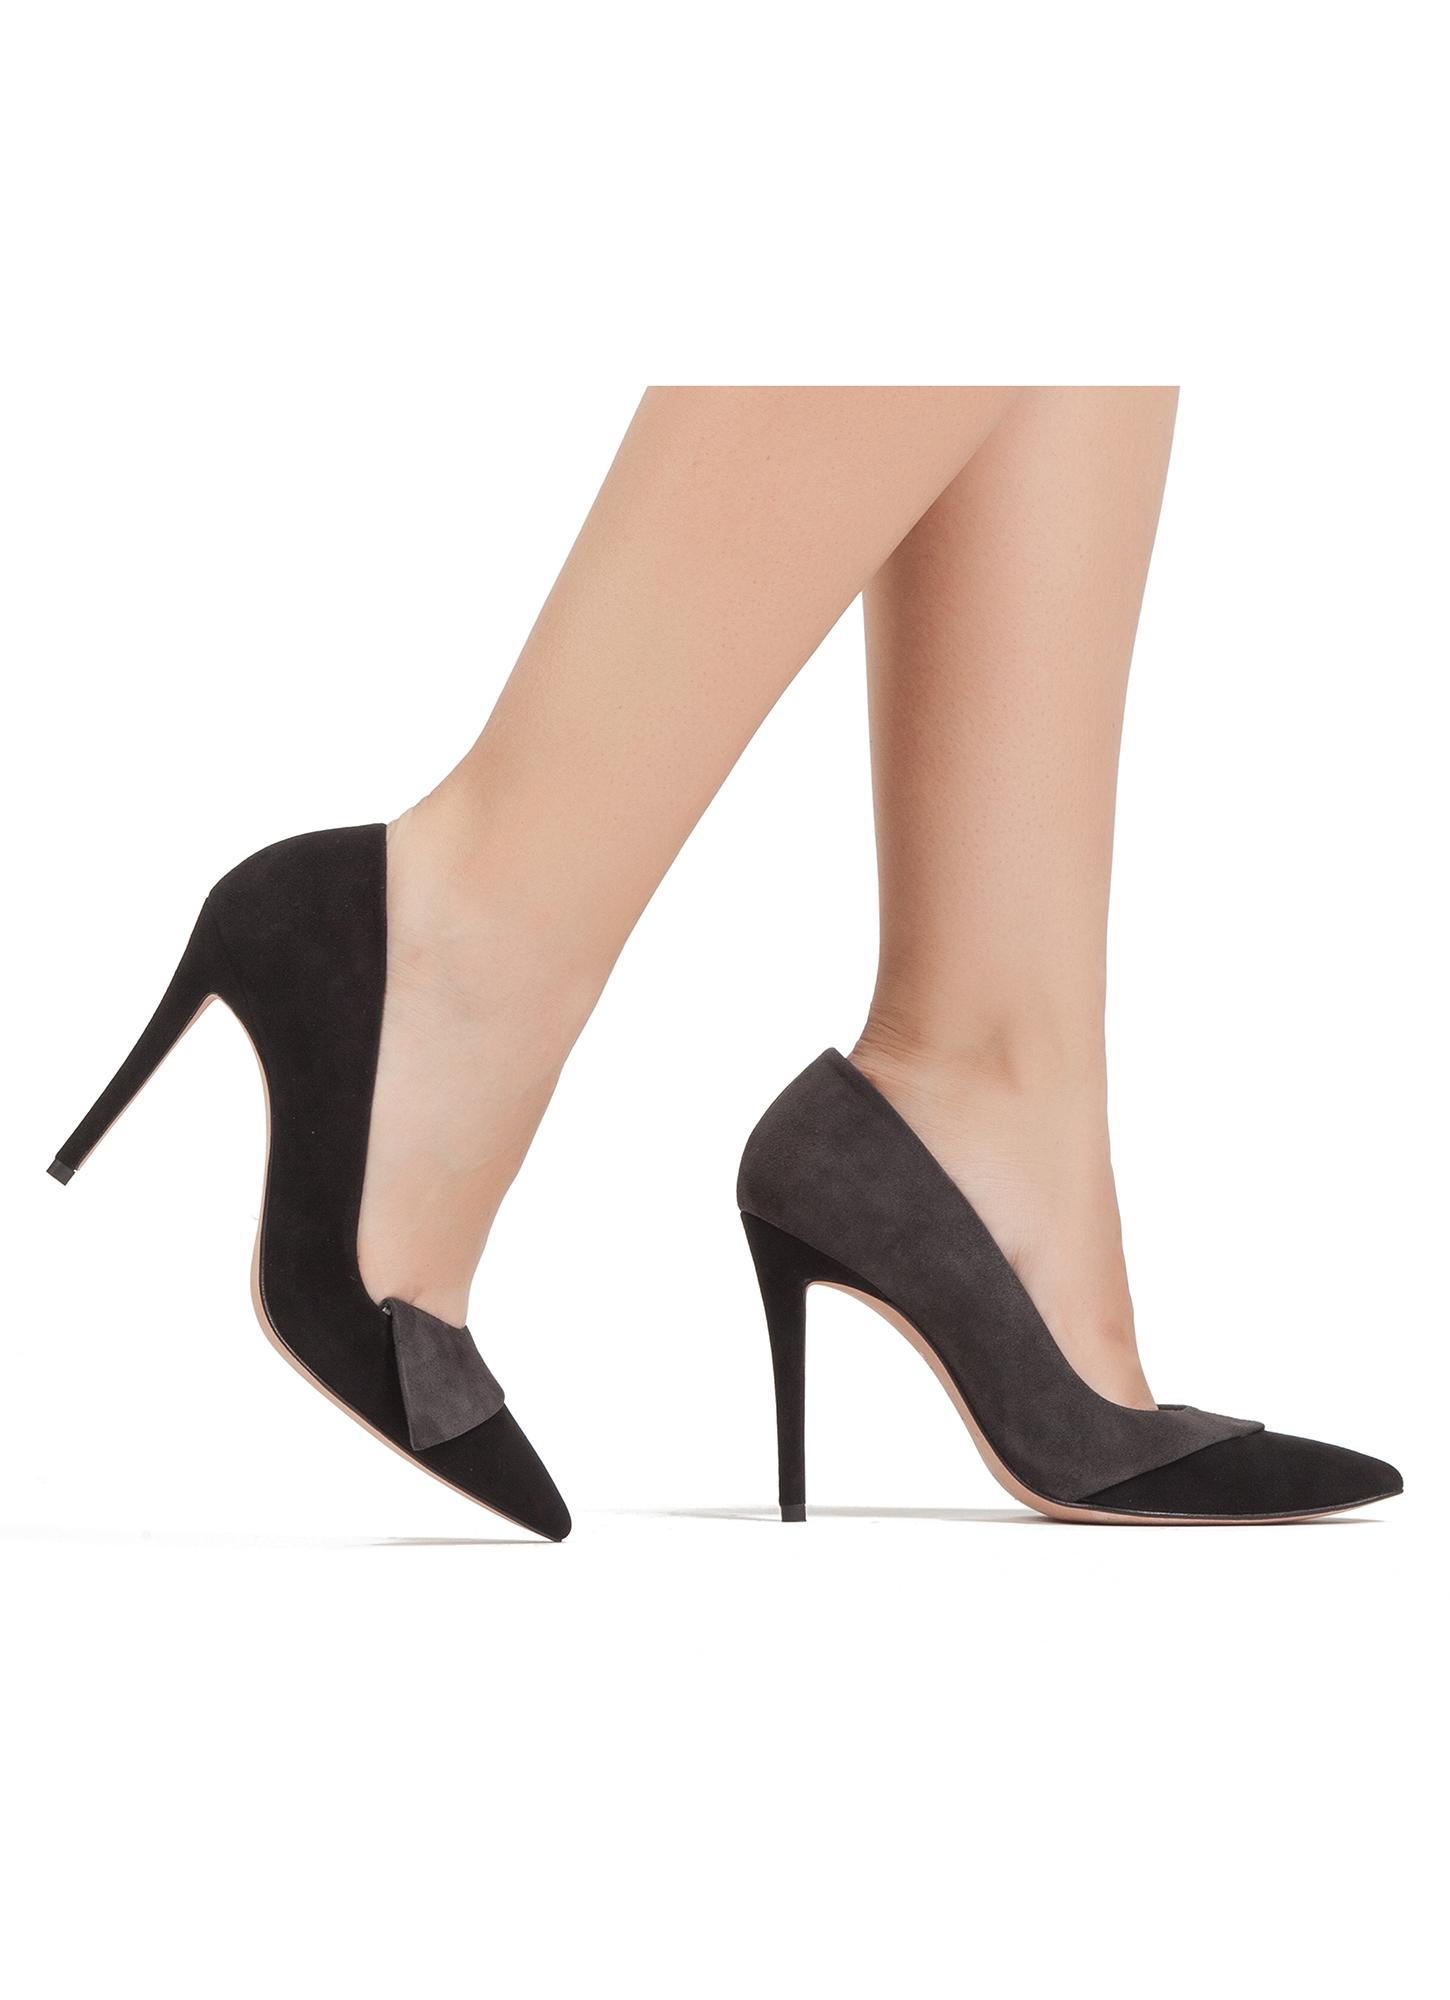 Pura Lopez High heeled boots - antracita W9354pgUe